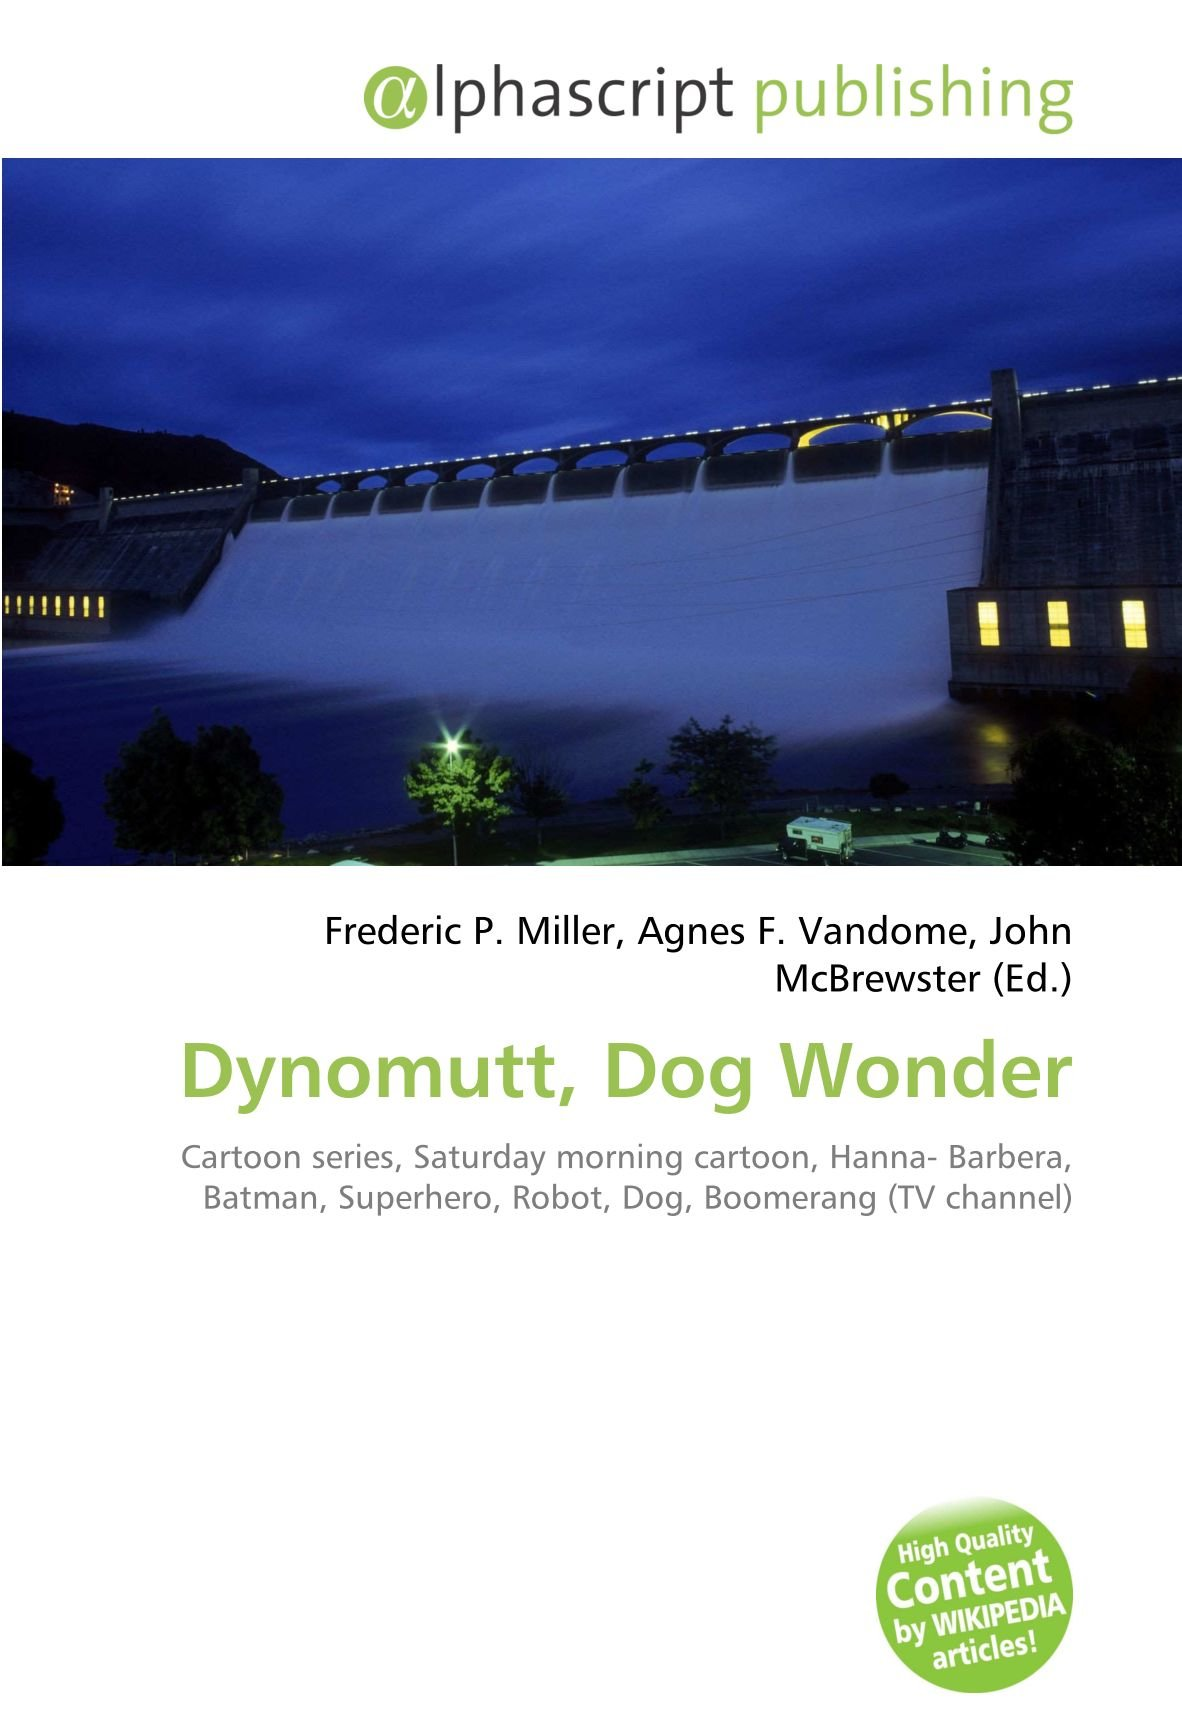 Dynomutt, Dog Wonder: Amazon.es: Miller, Frederic P., Vandome, Agnes F., McBrewster, John: Libros en idiomas extranjeros